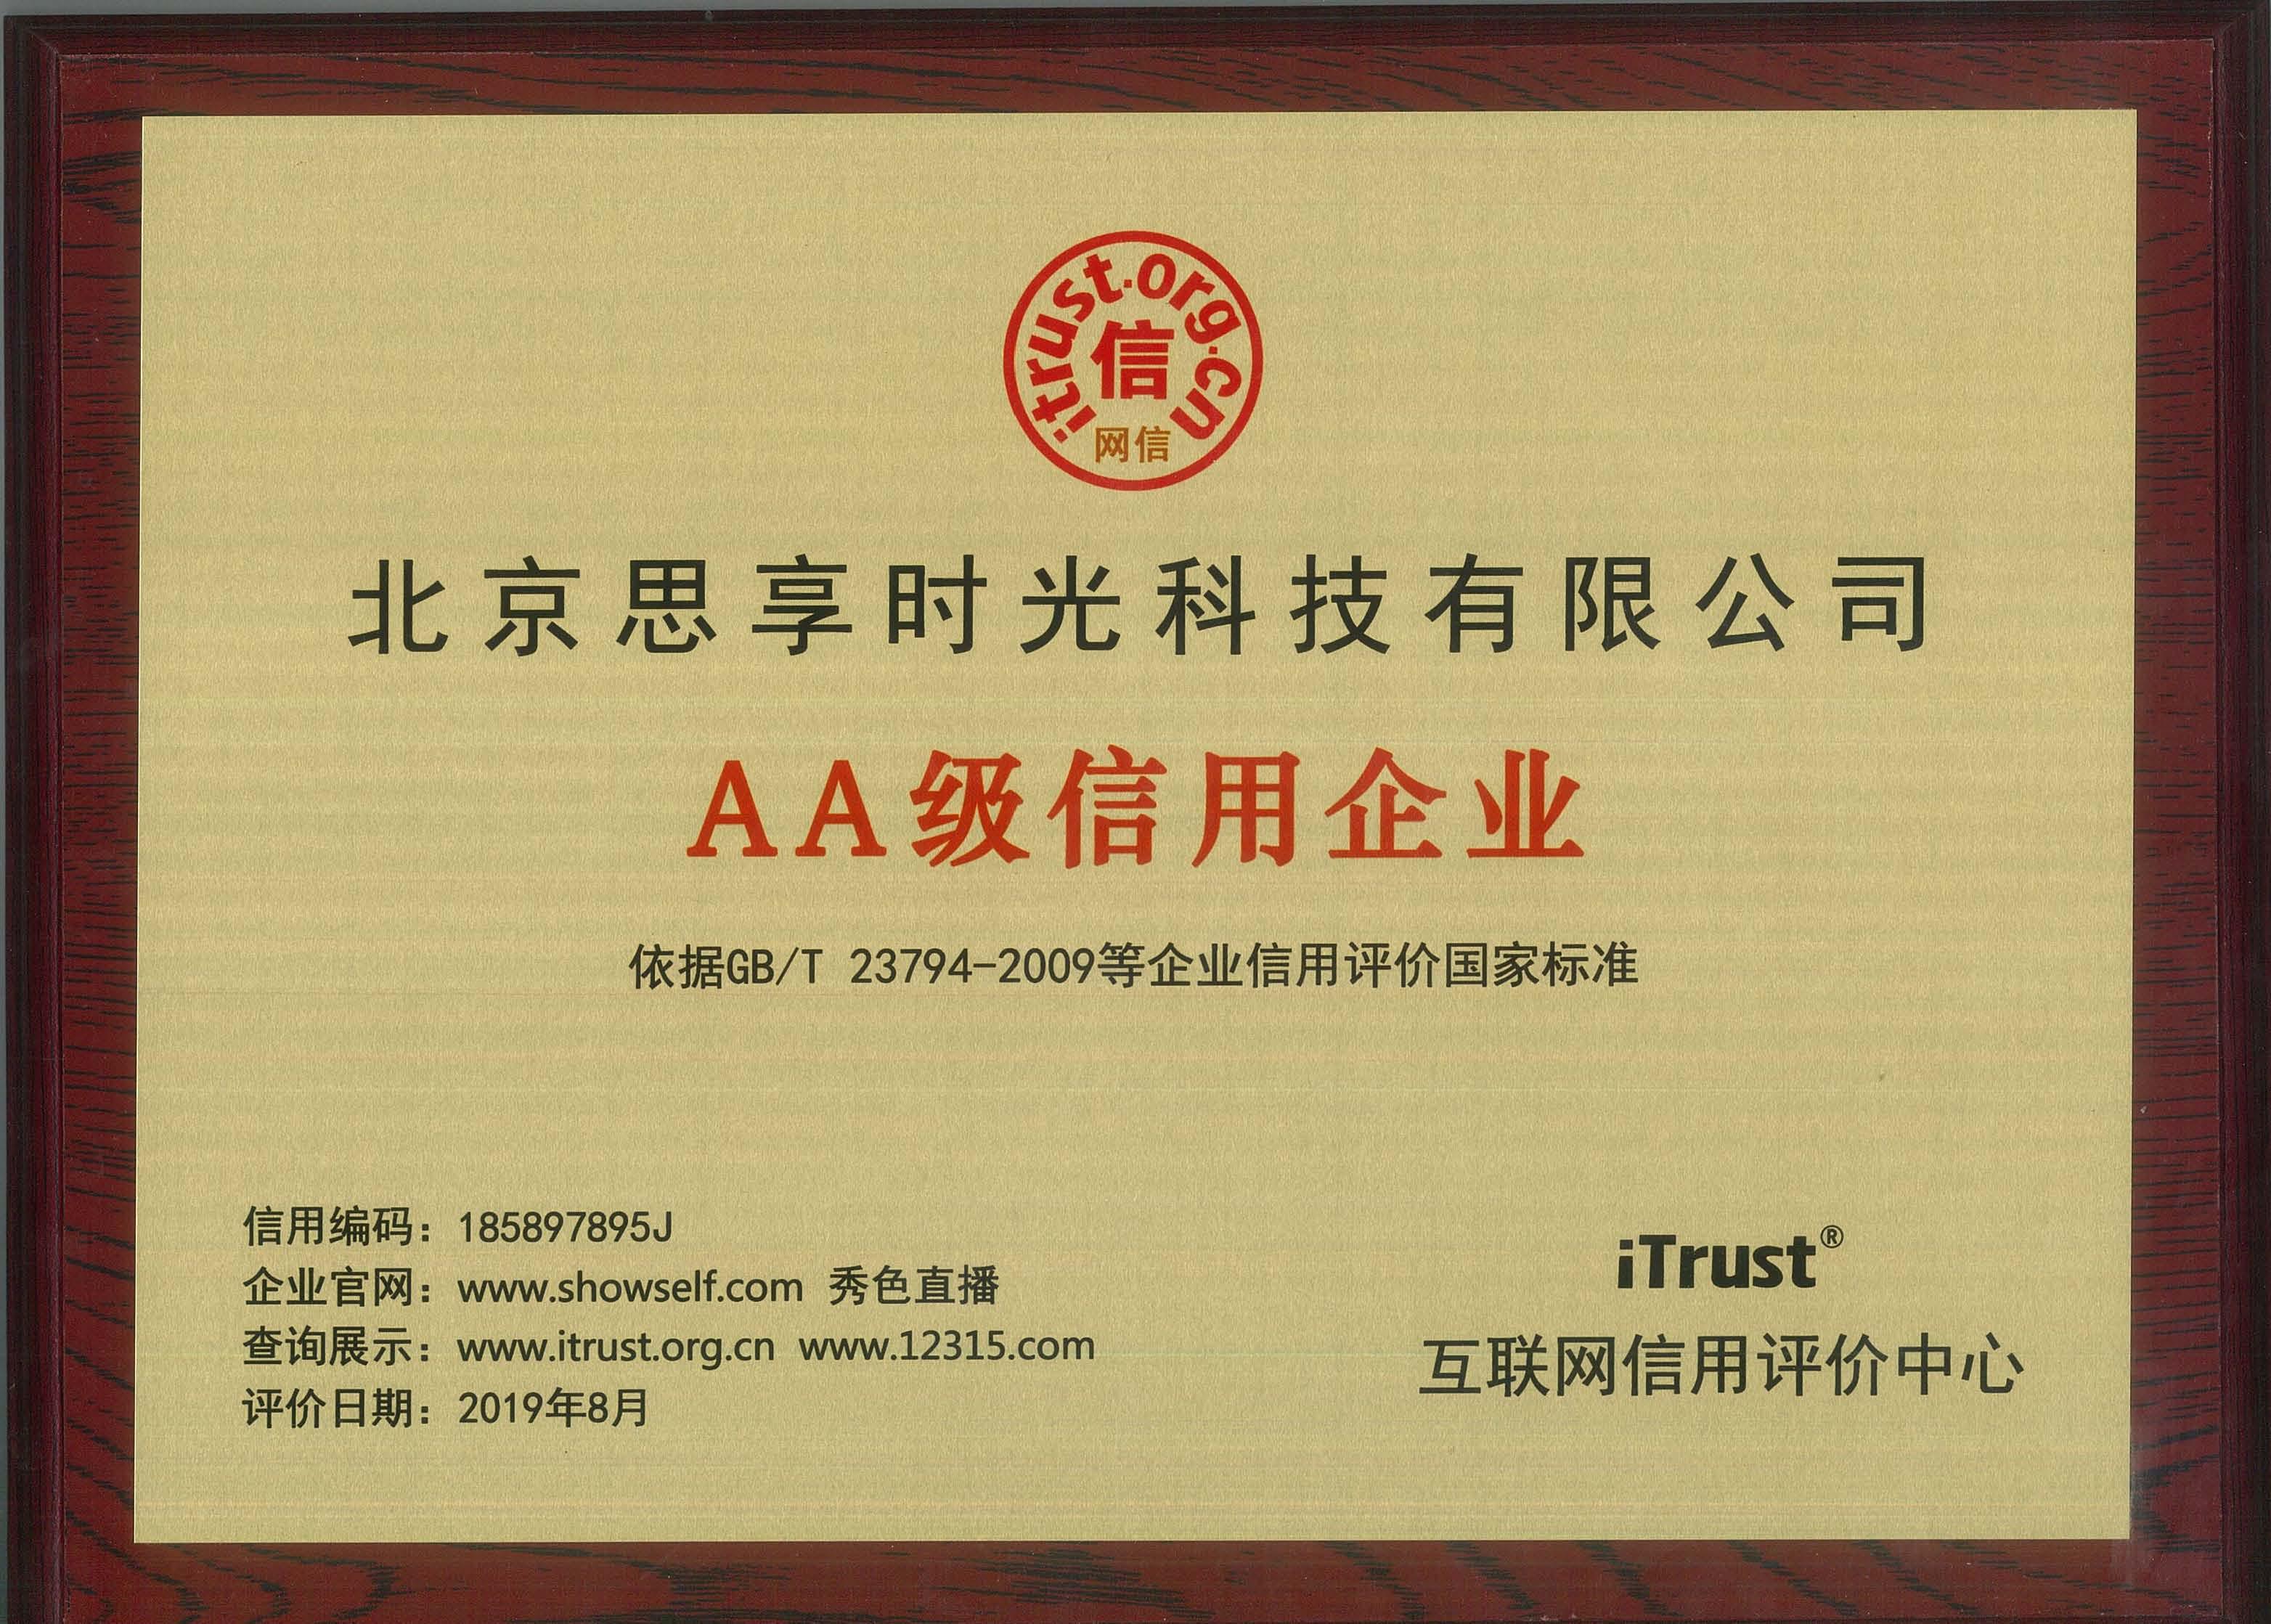 AA Credit Enterprises